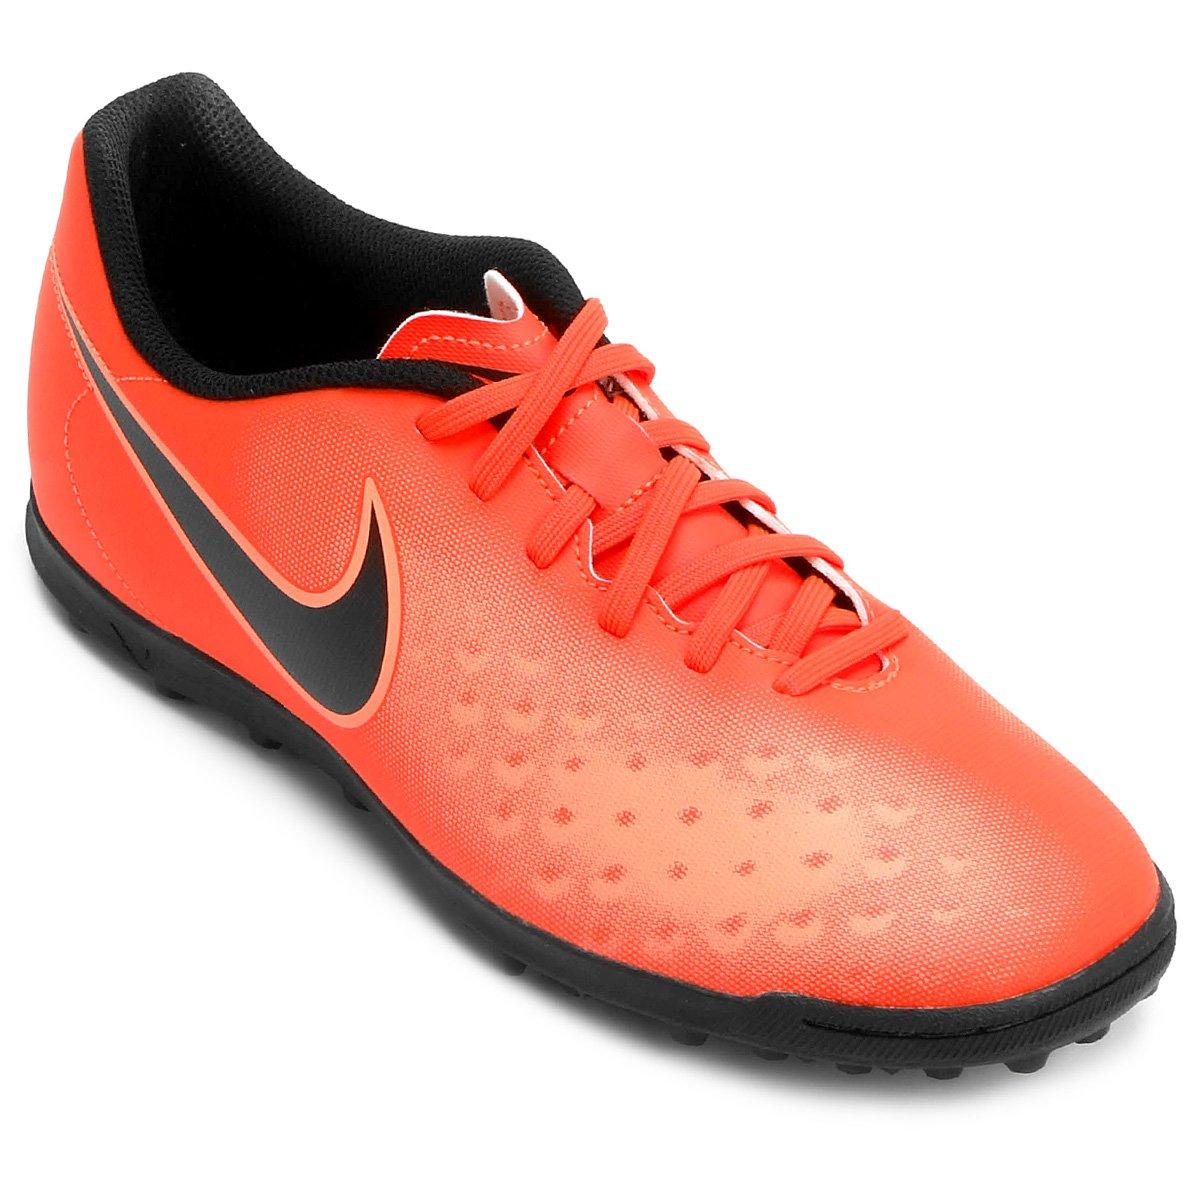 6162327908b31 Chuteira Society Nike Magista Ola II TF Masculina - Compre Agora ...